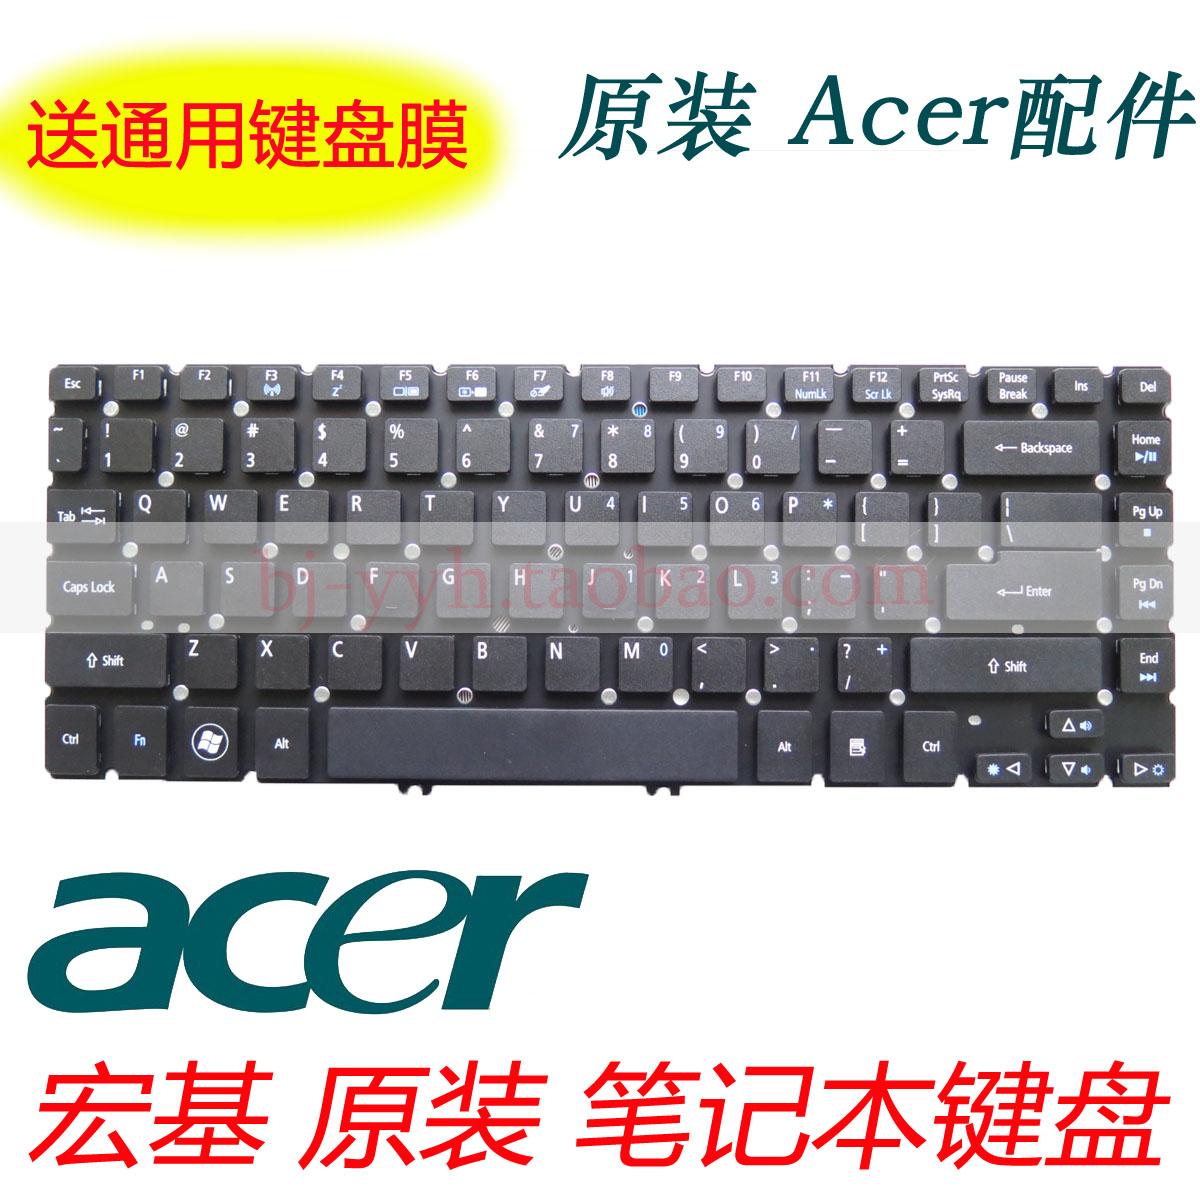 原装Acer宏基4755 3830T键盘EC-470 MS2376 4830TG电脑笔记本键盘